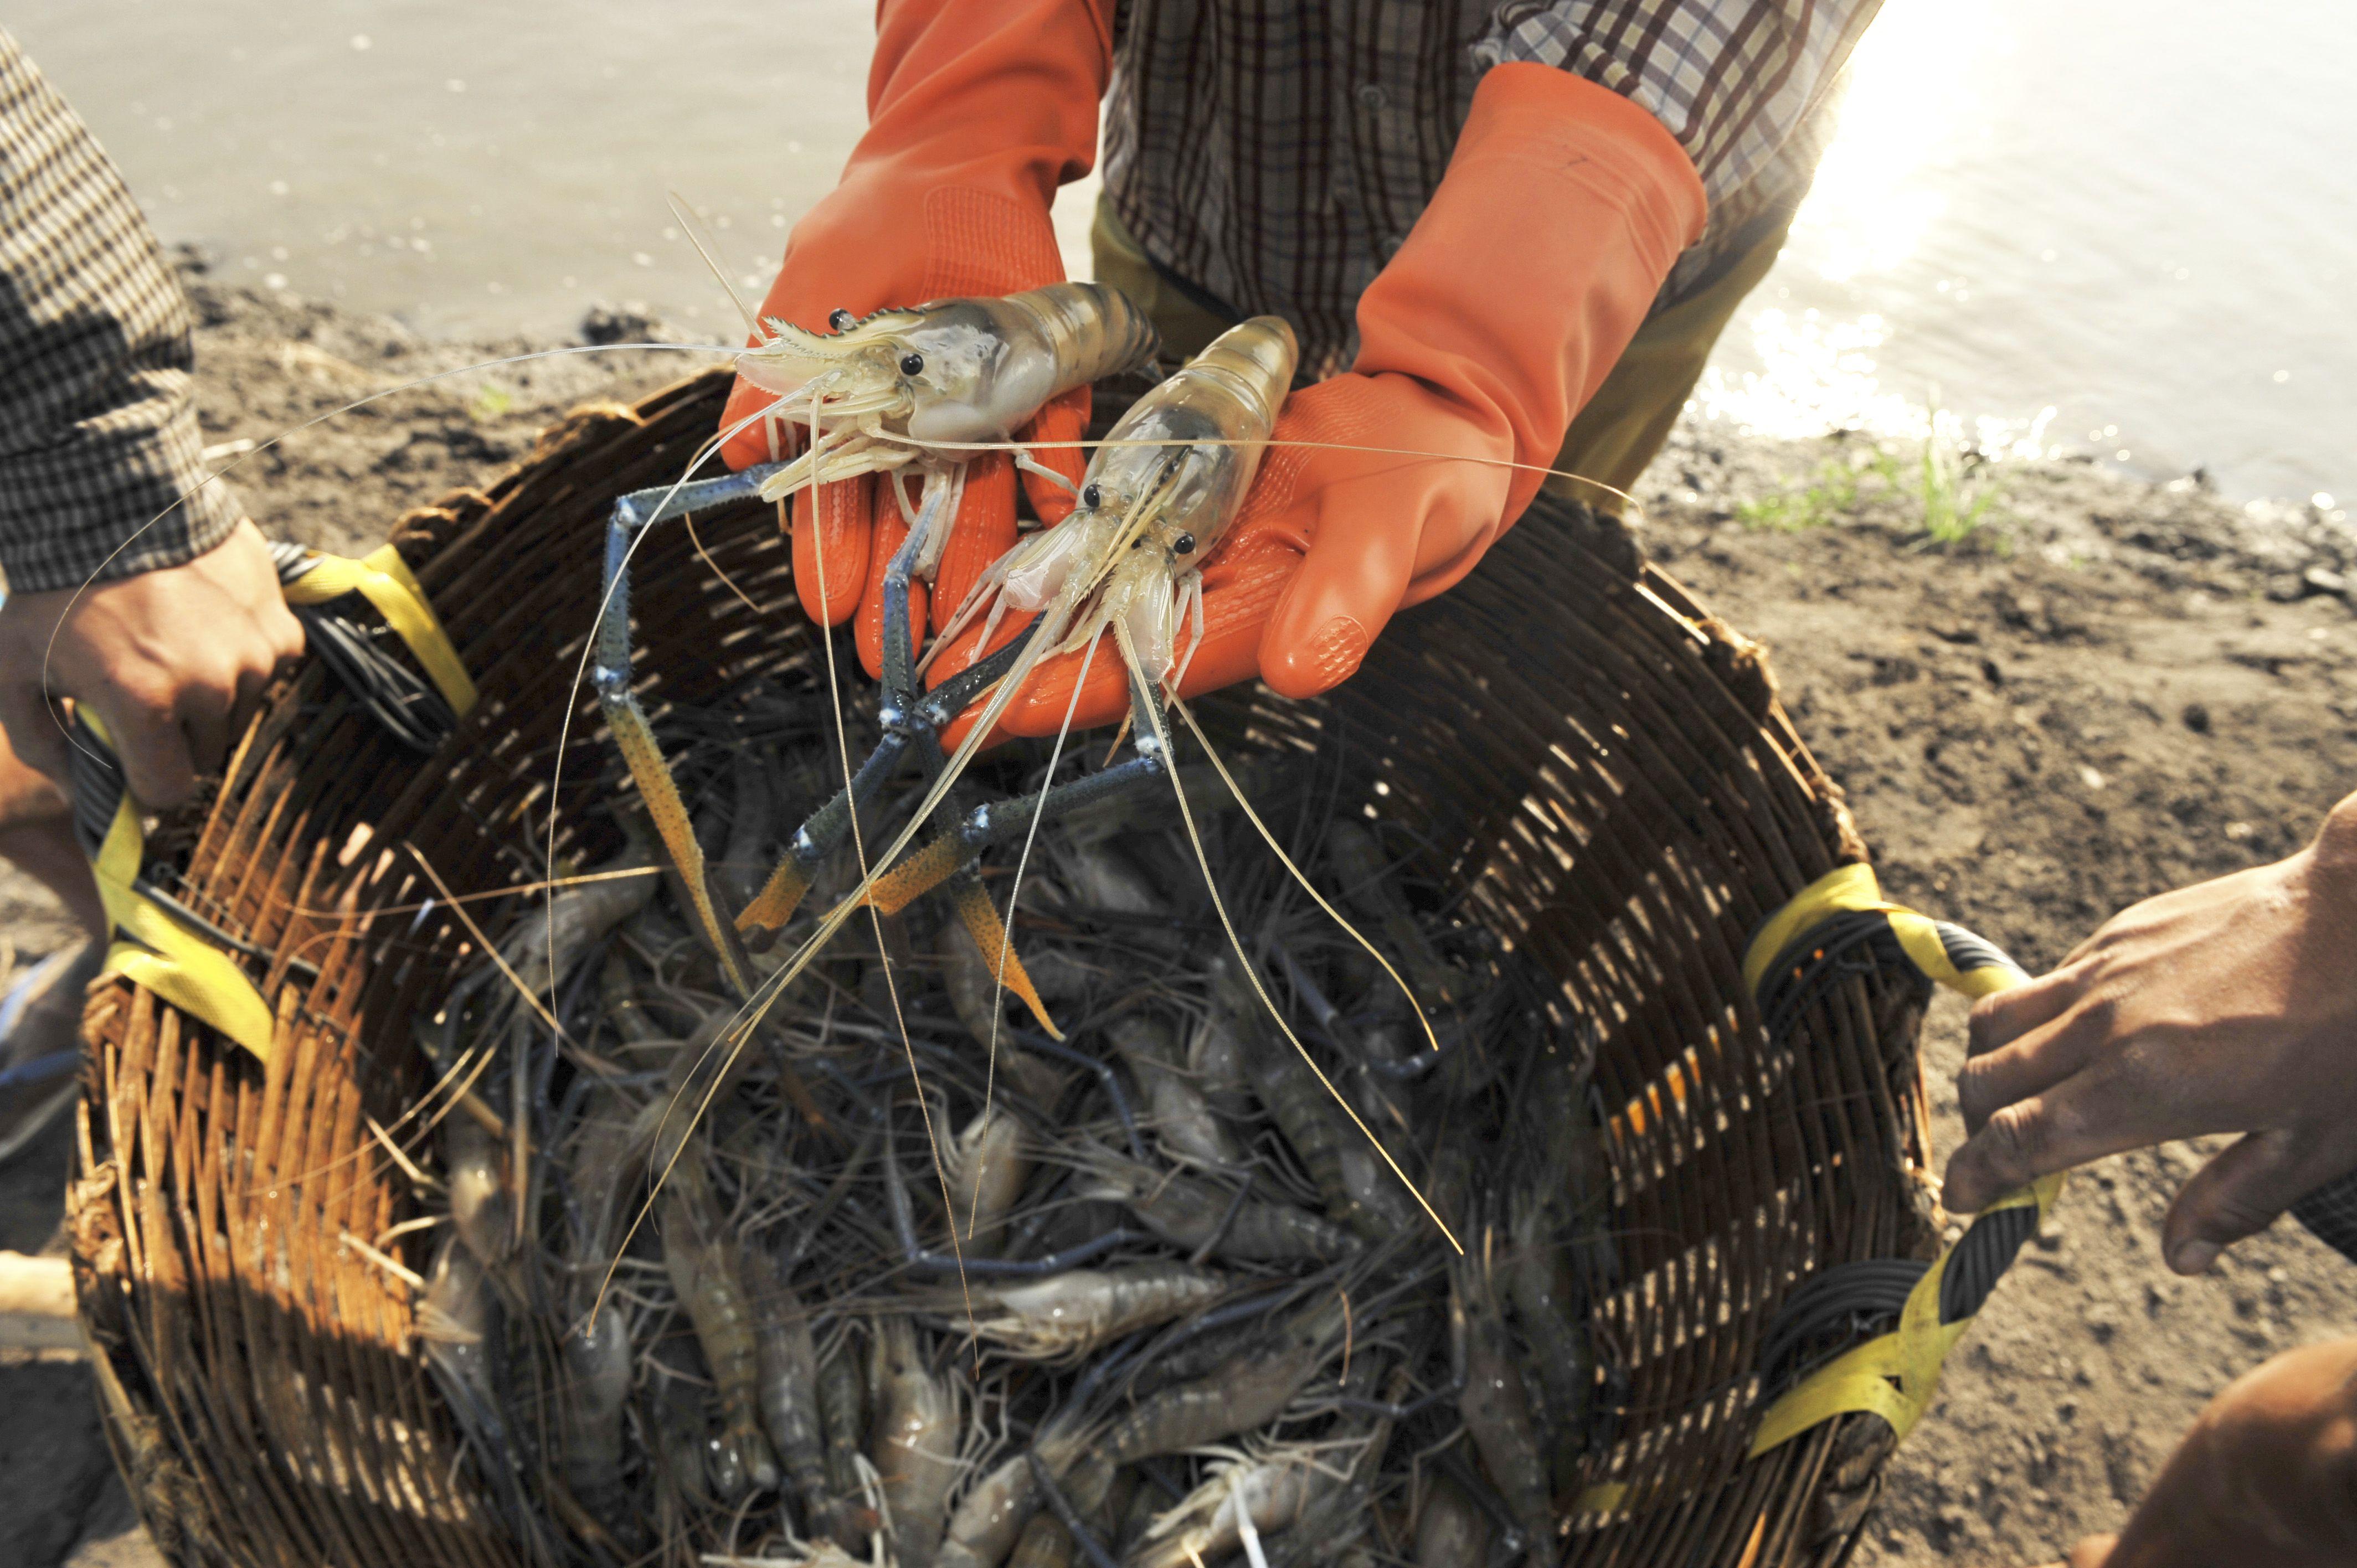 liveaquaponics com freshwater prawn macrobrachium rosenbergii